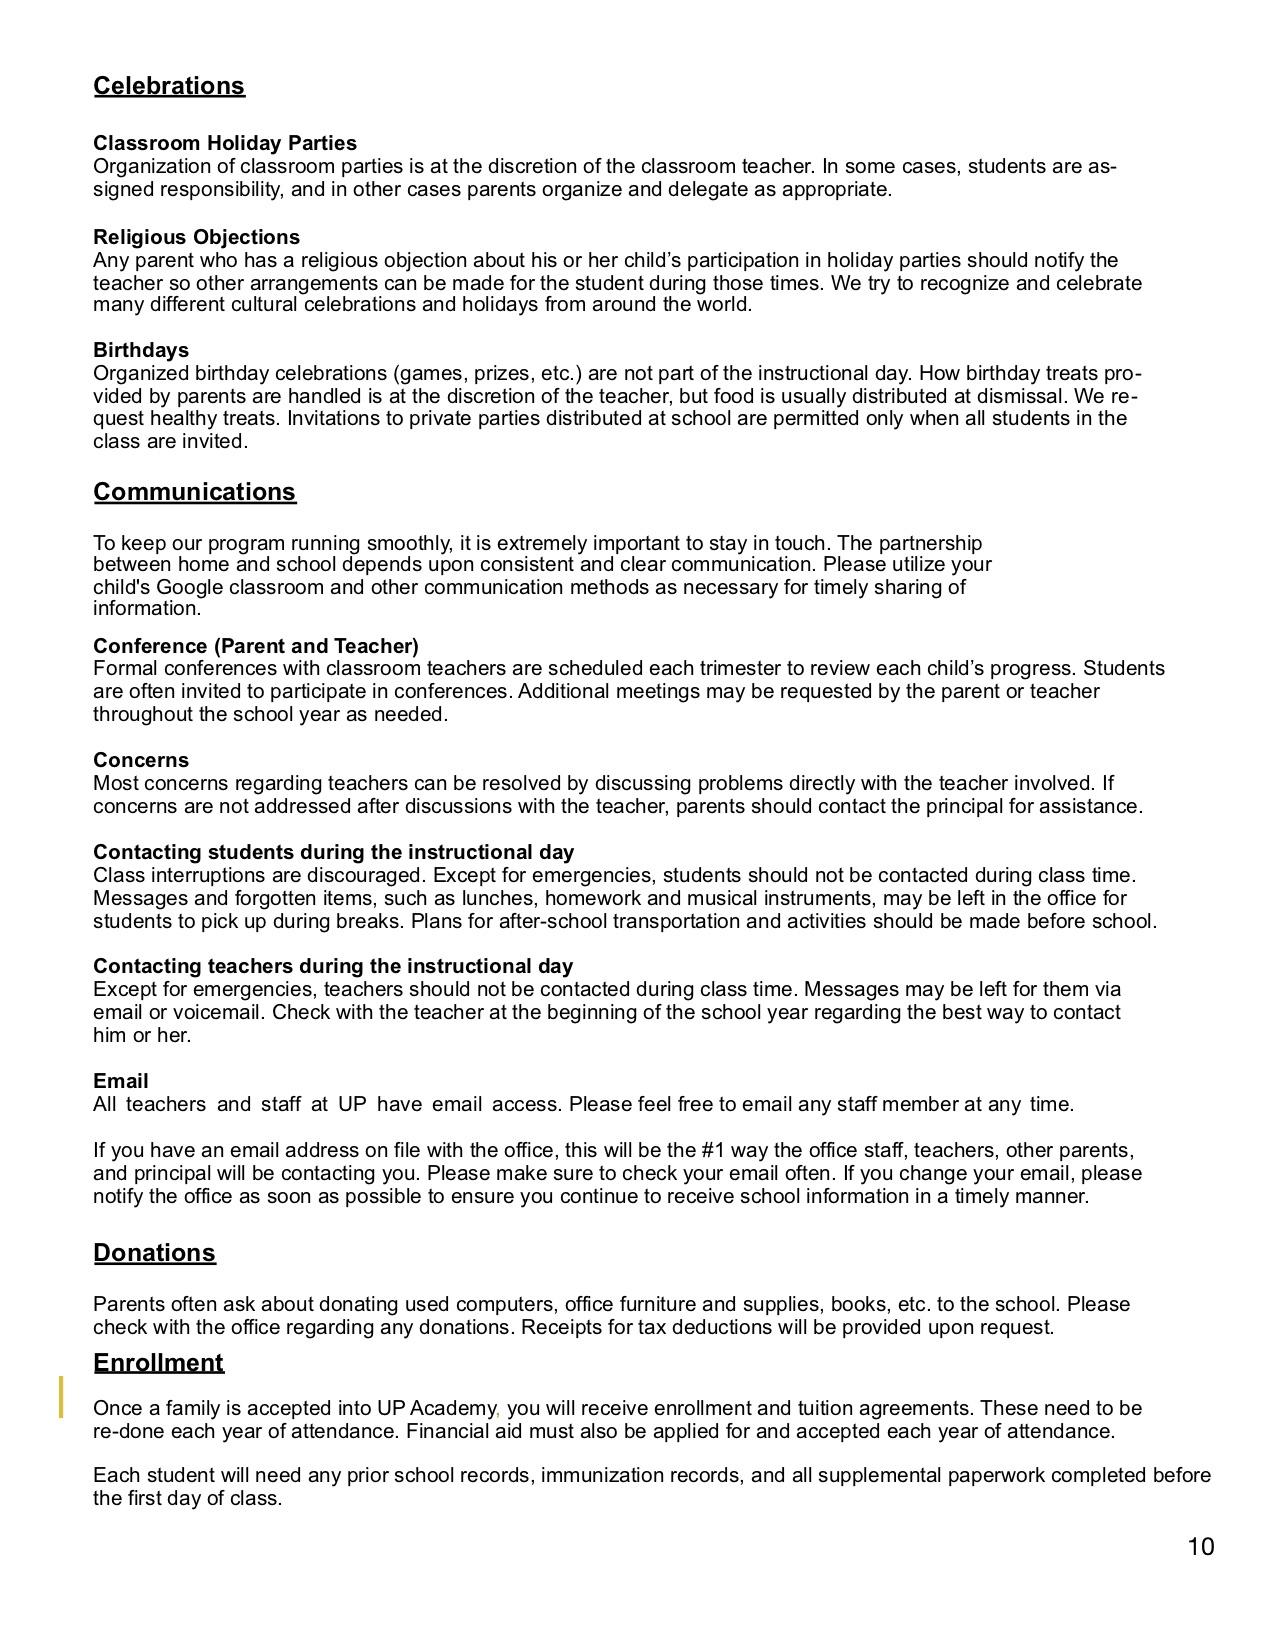 18-19 Parent and Student Handbook V4-9.jpg